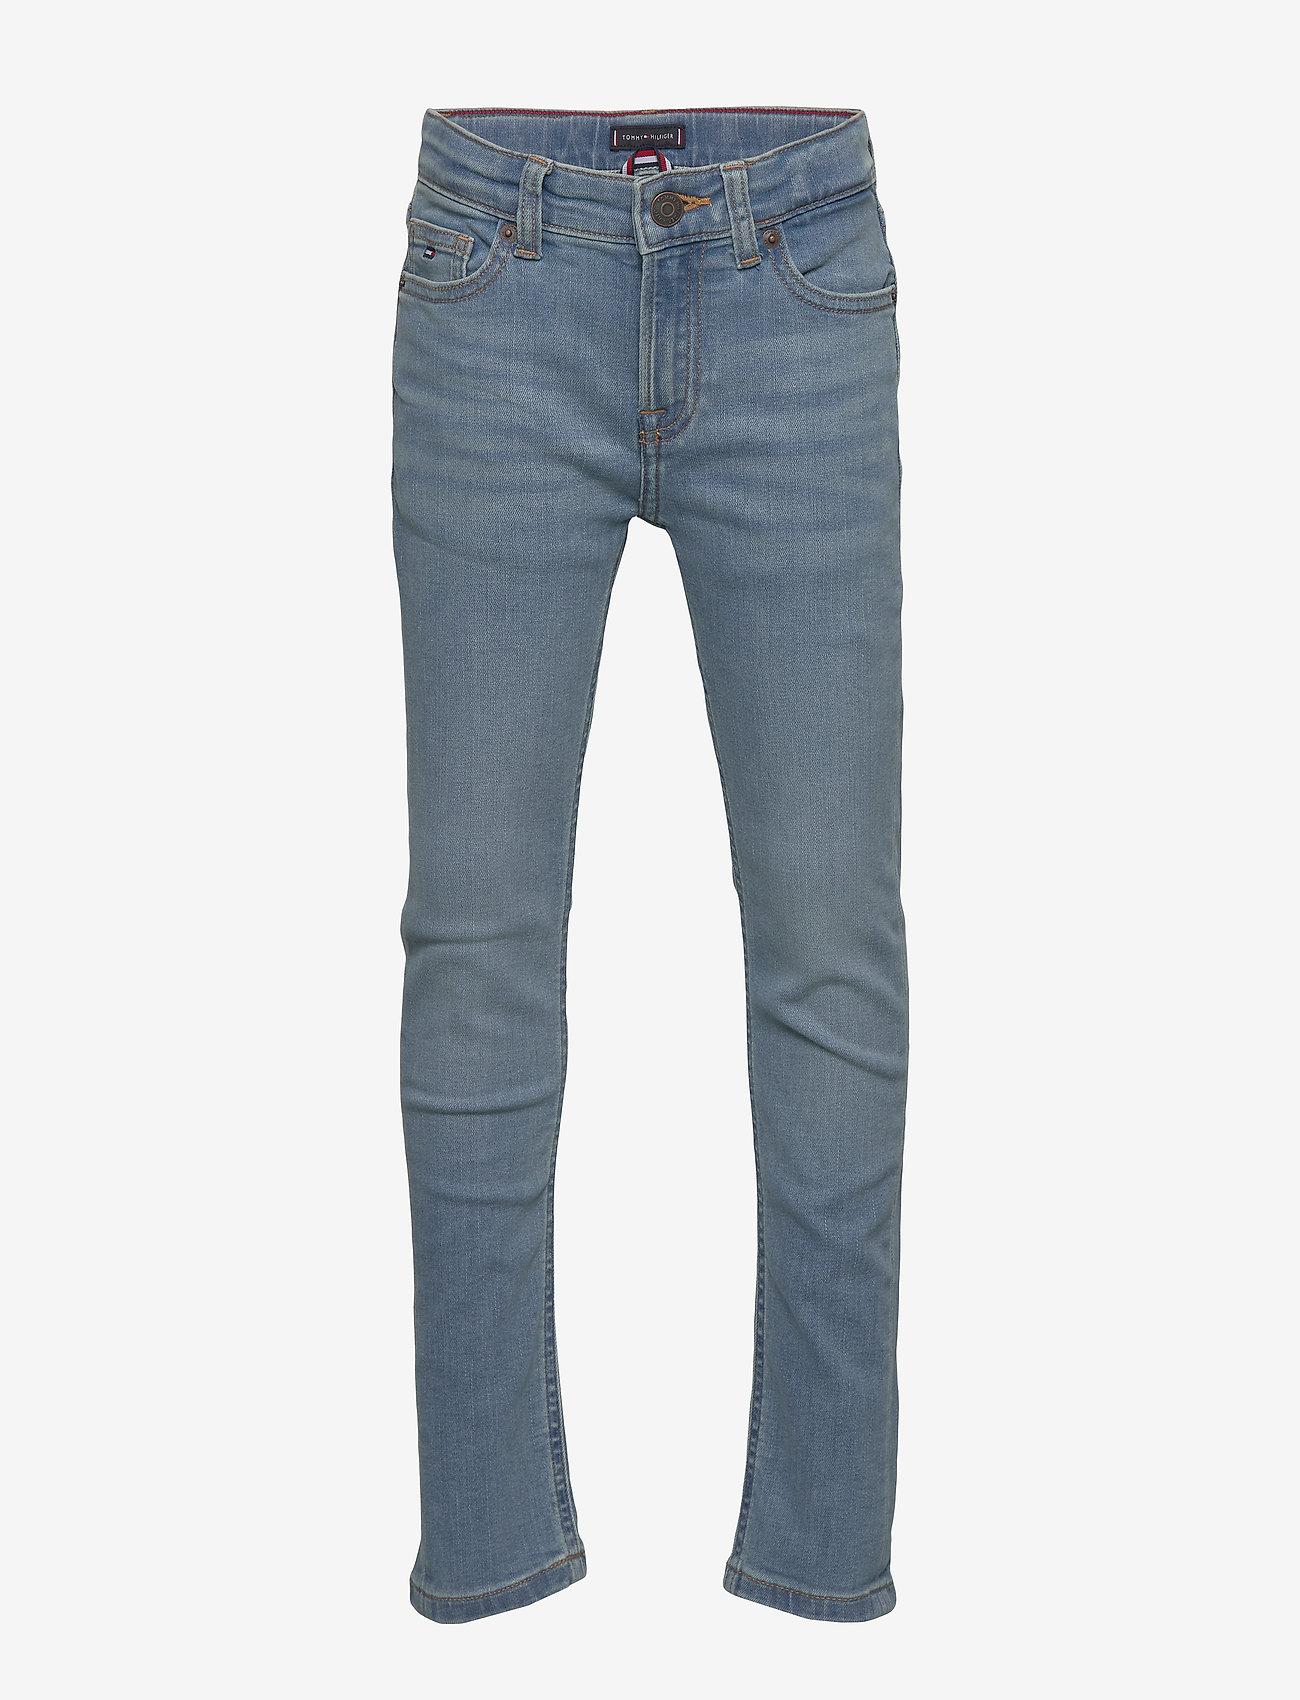 Tommy Hilfiger - SIMON SKINNY OCLBST - jeans - ocean light blue stretch